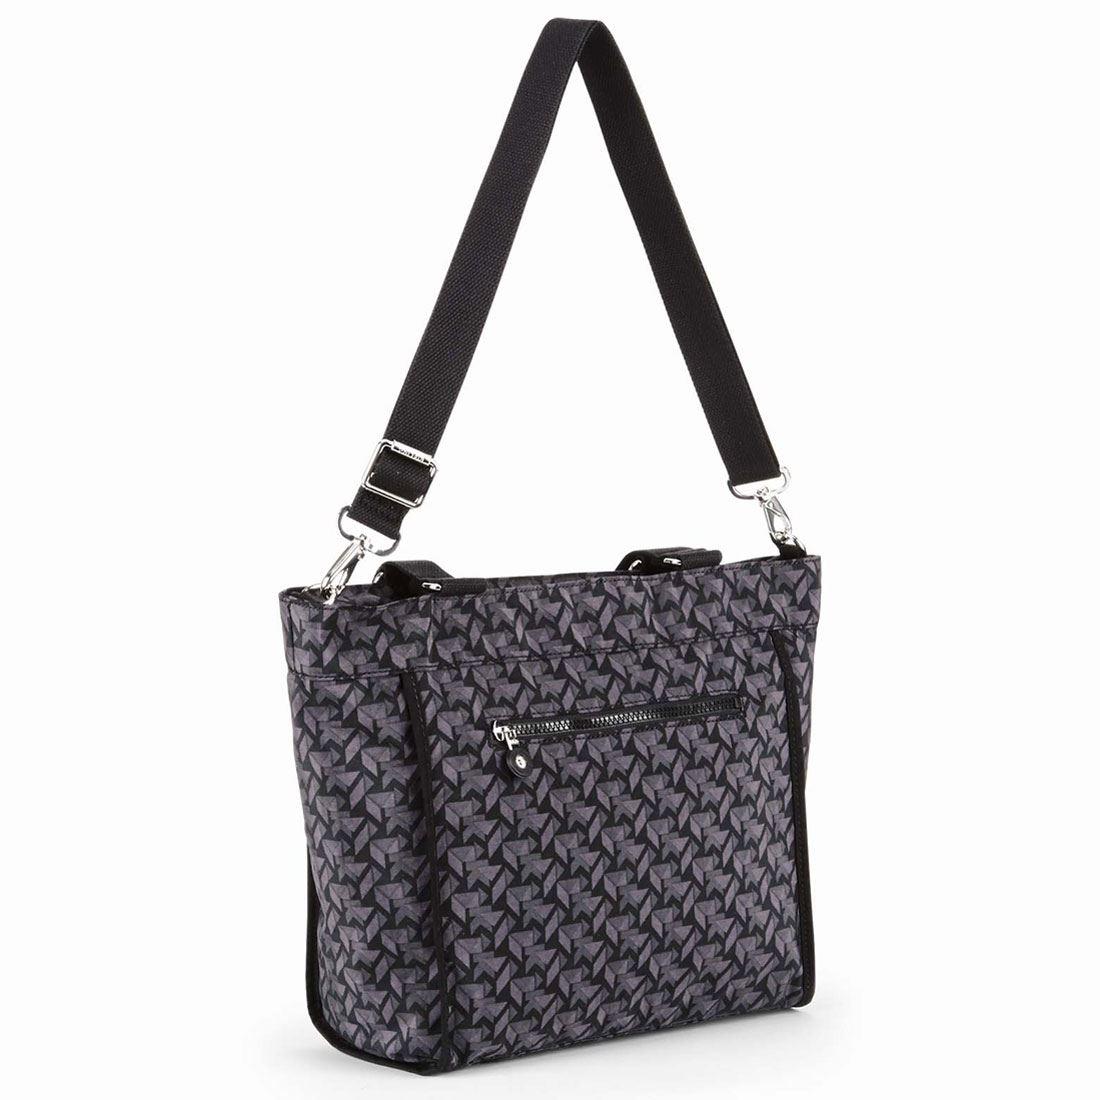 5716c9e917 Kipling New Shopper S Shopping Bag with Shoulder Strap New 2017 ...